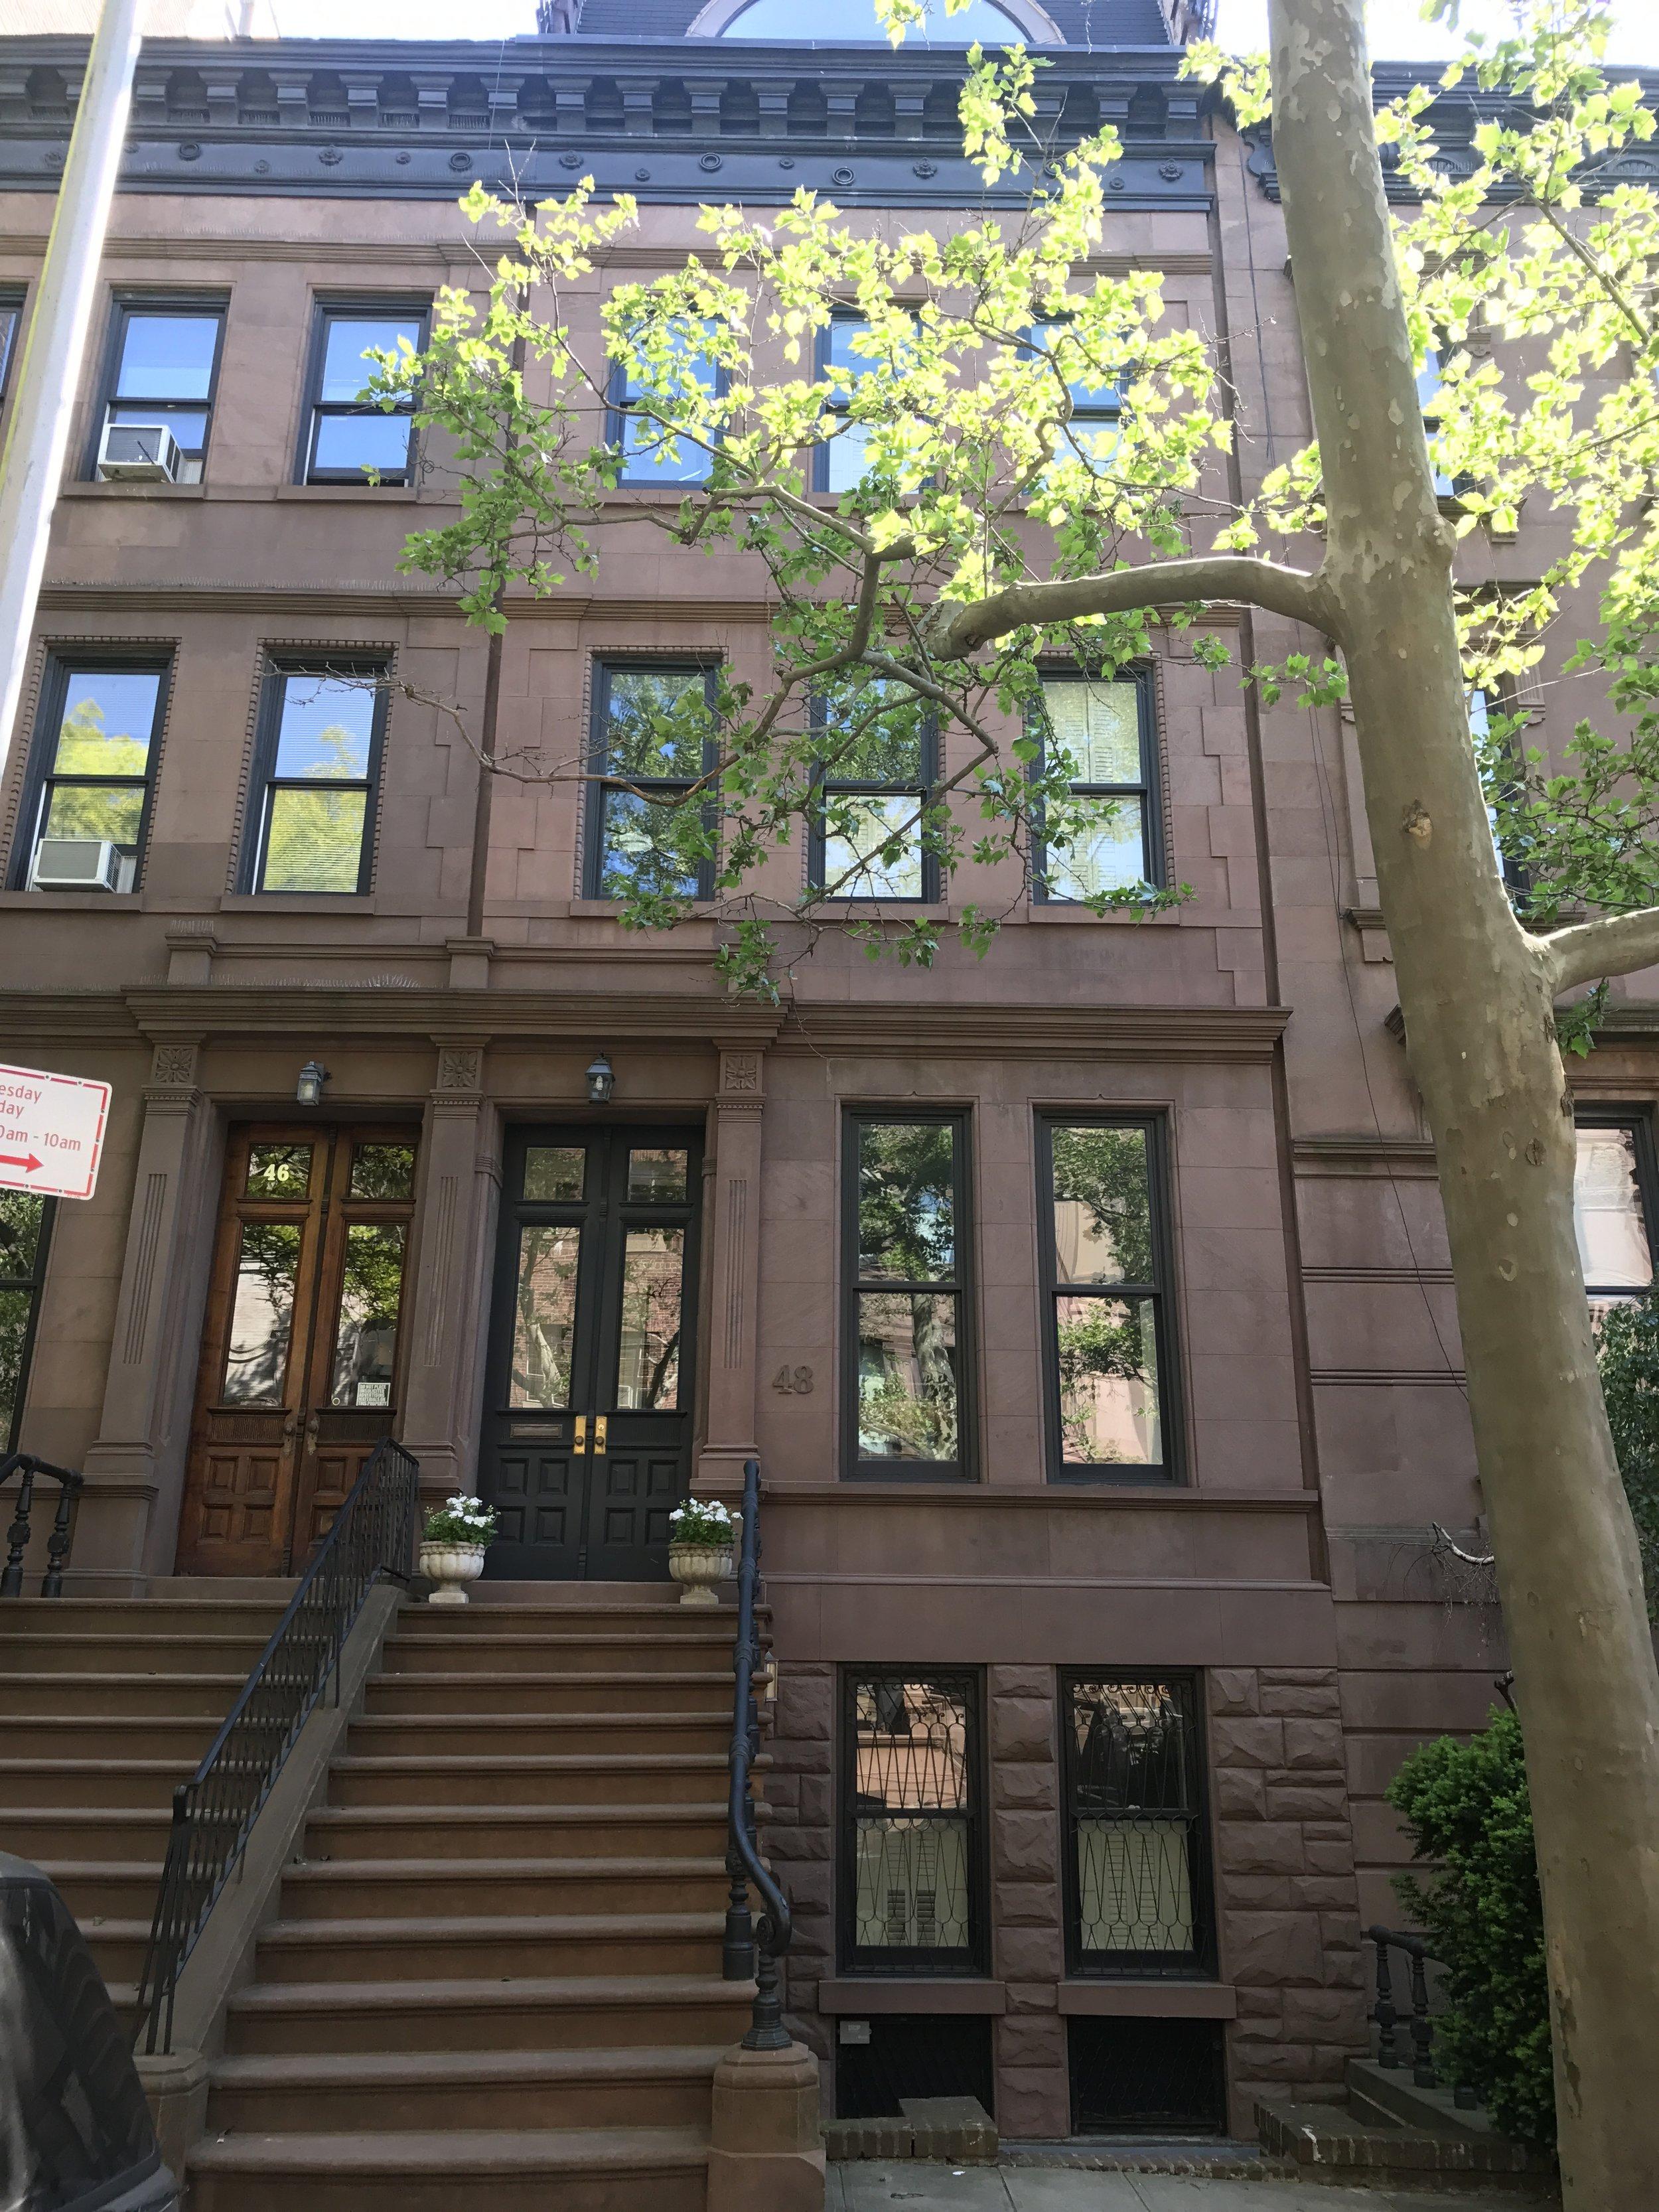 48 West 84th Street - Architect:Hottenroth + Joseph Architects5 story single family residence